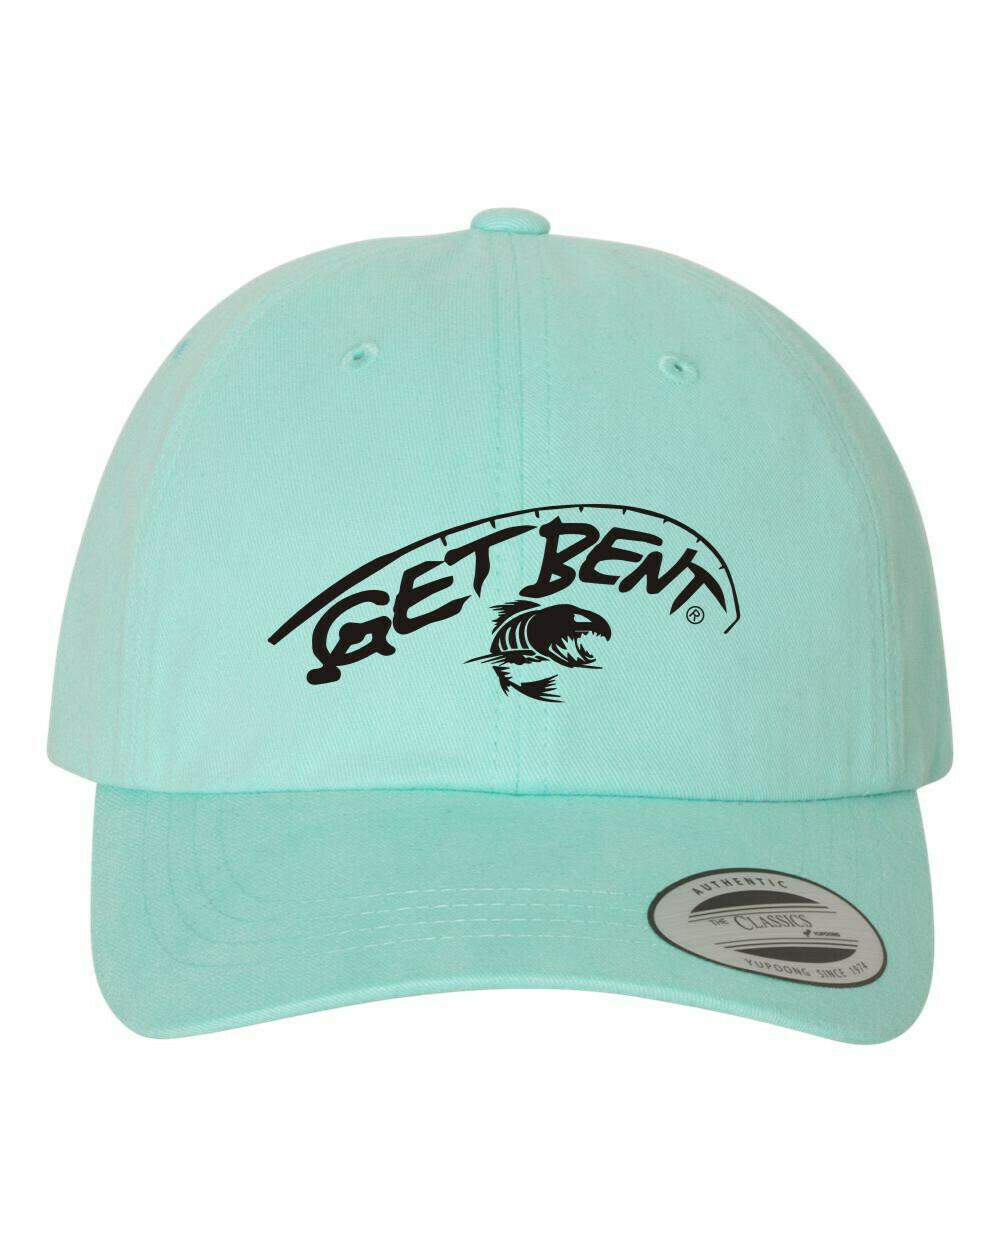 'Get Bent' - Dad Hats - Diamond Blue/Black